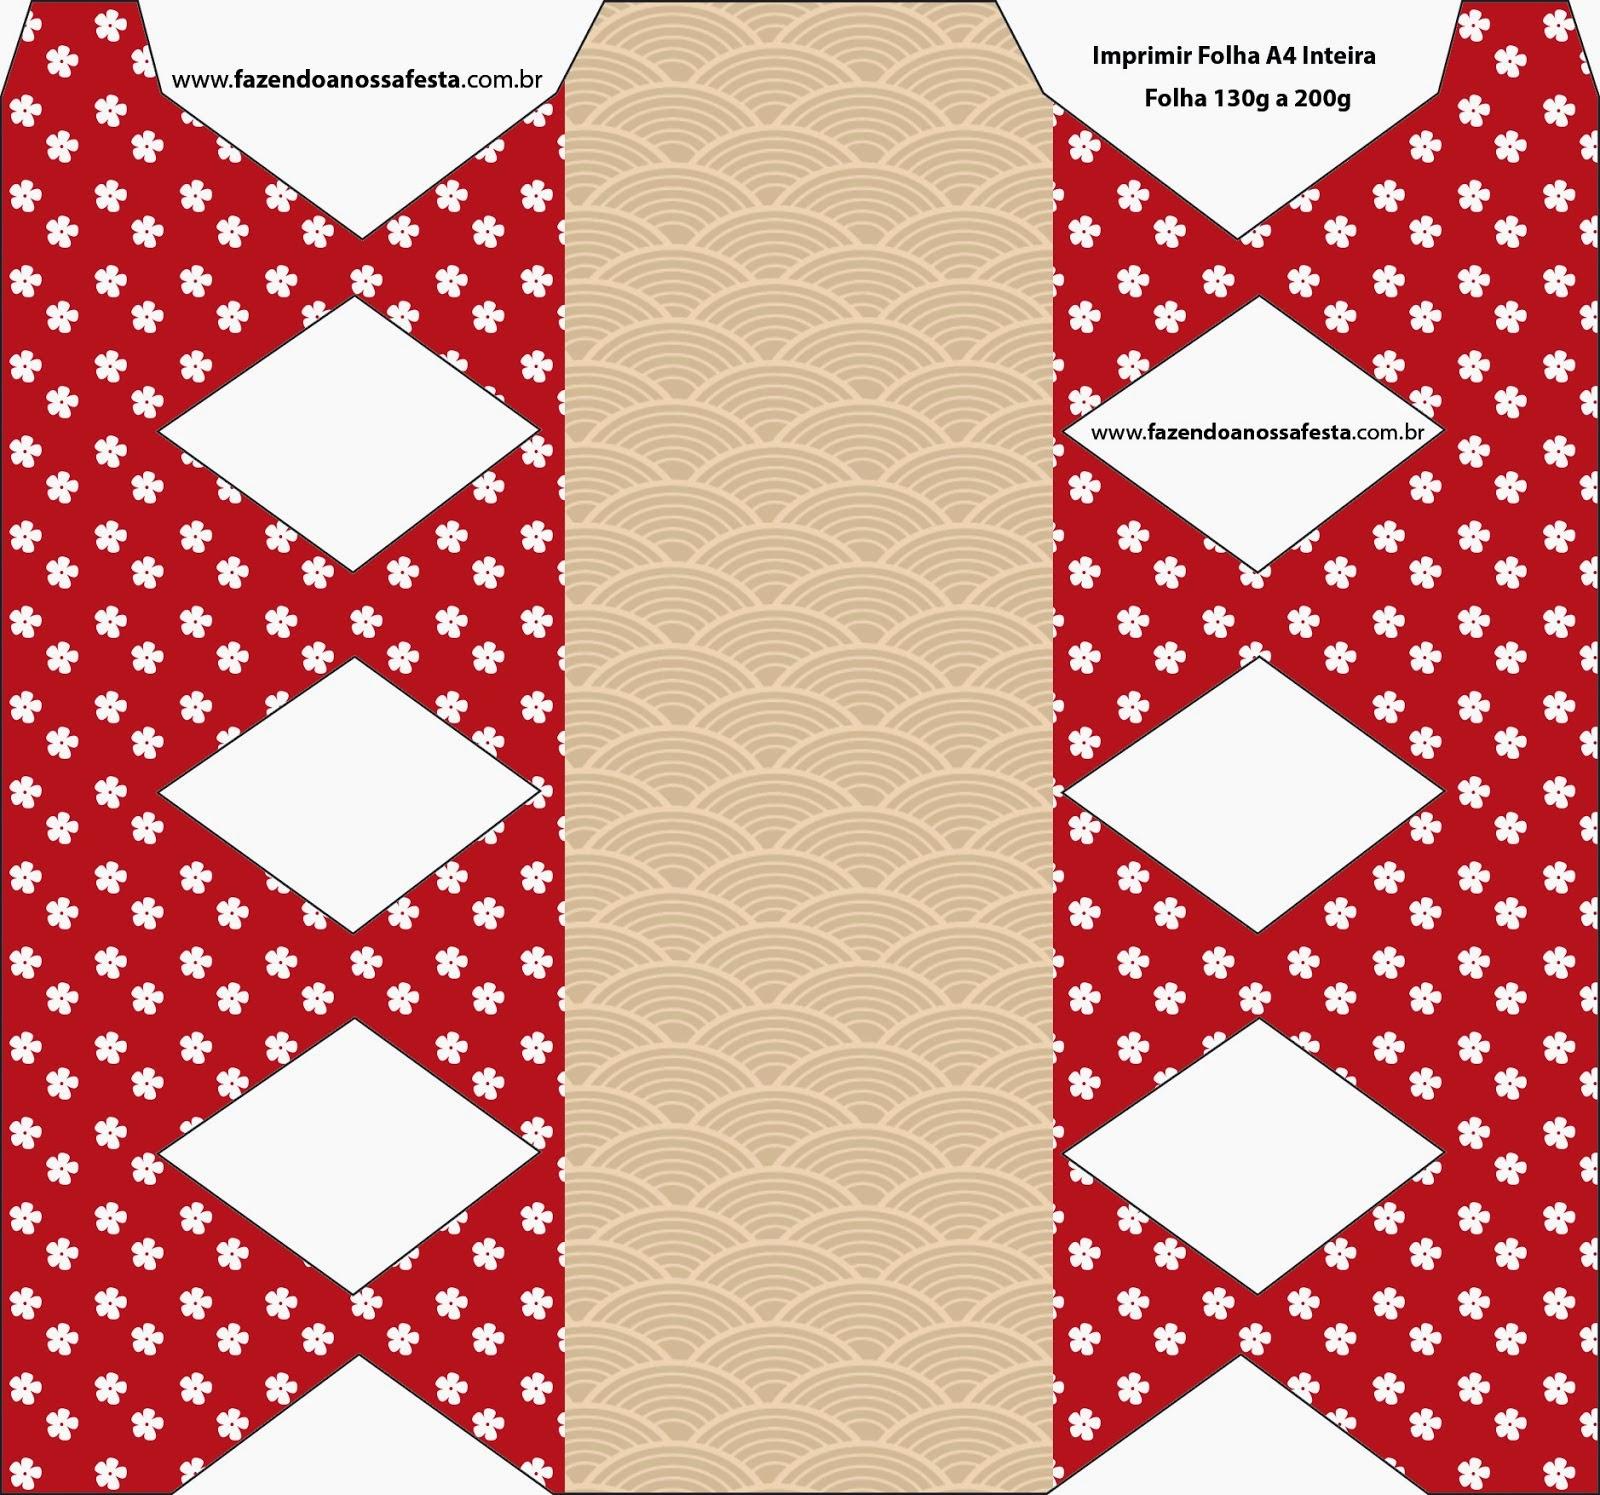 Cajas para Imprimir Gratis de Fiesta Estilo Japonés.